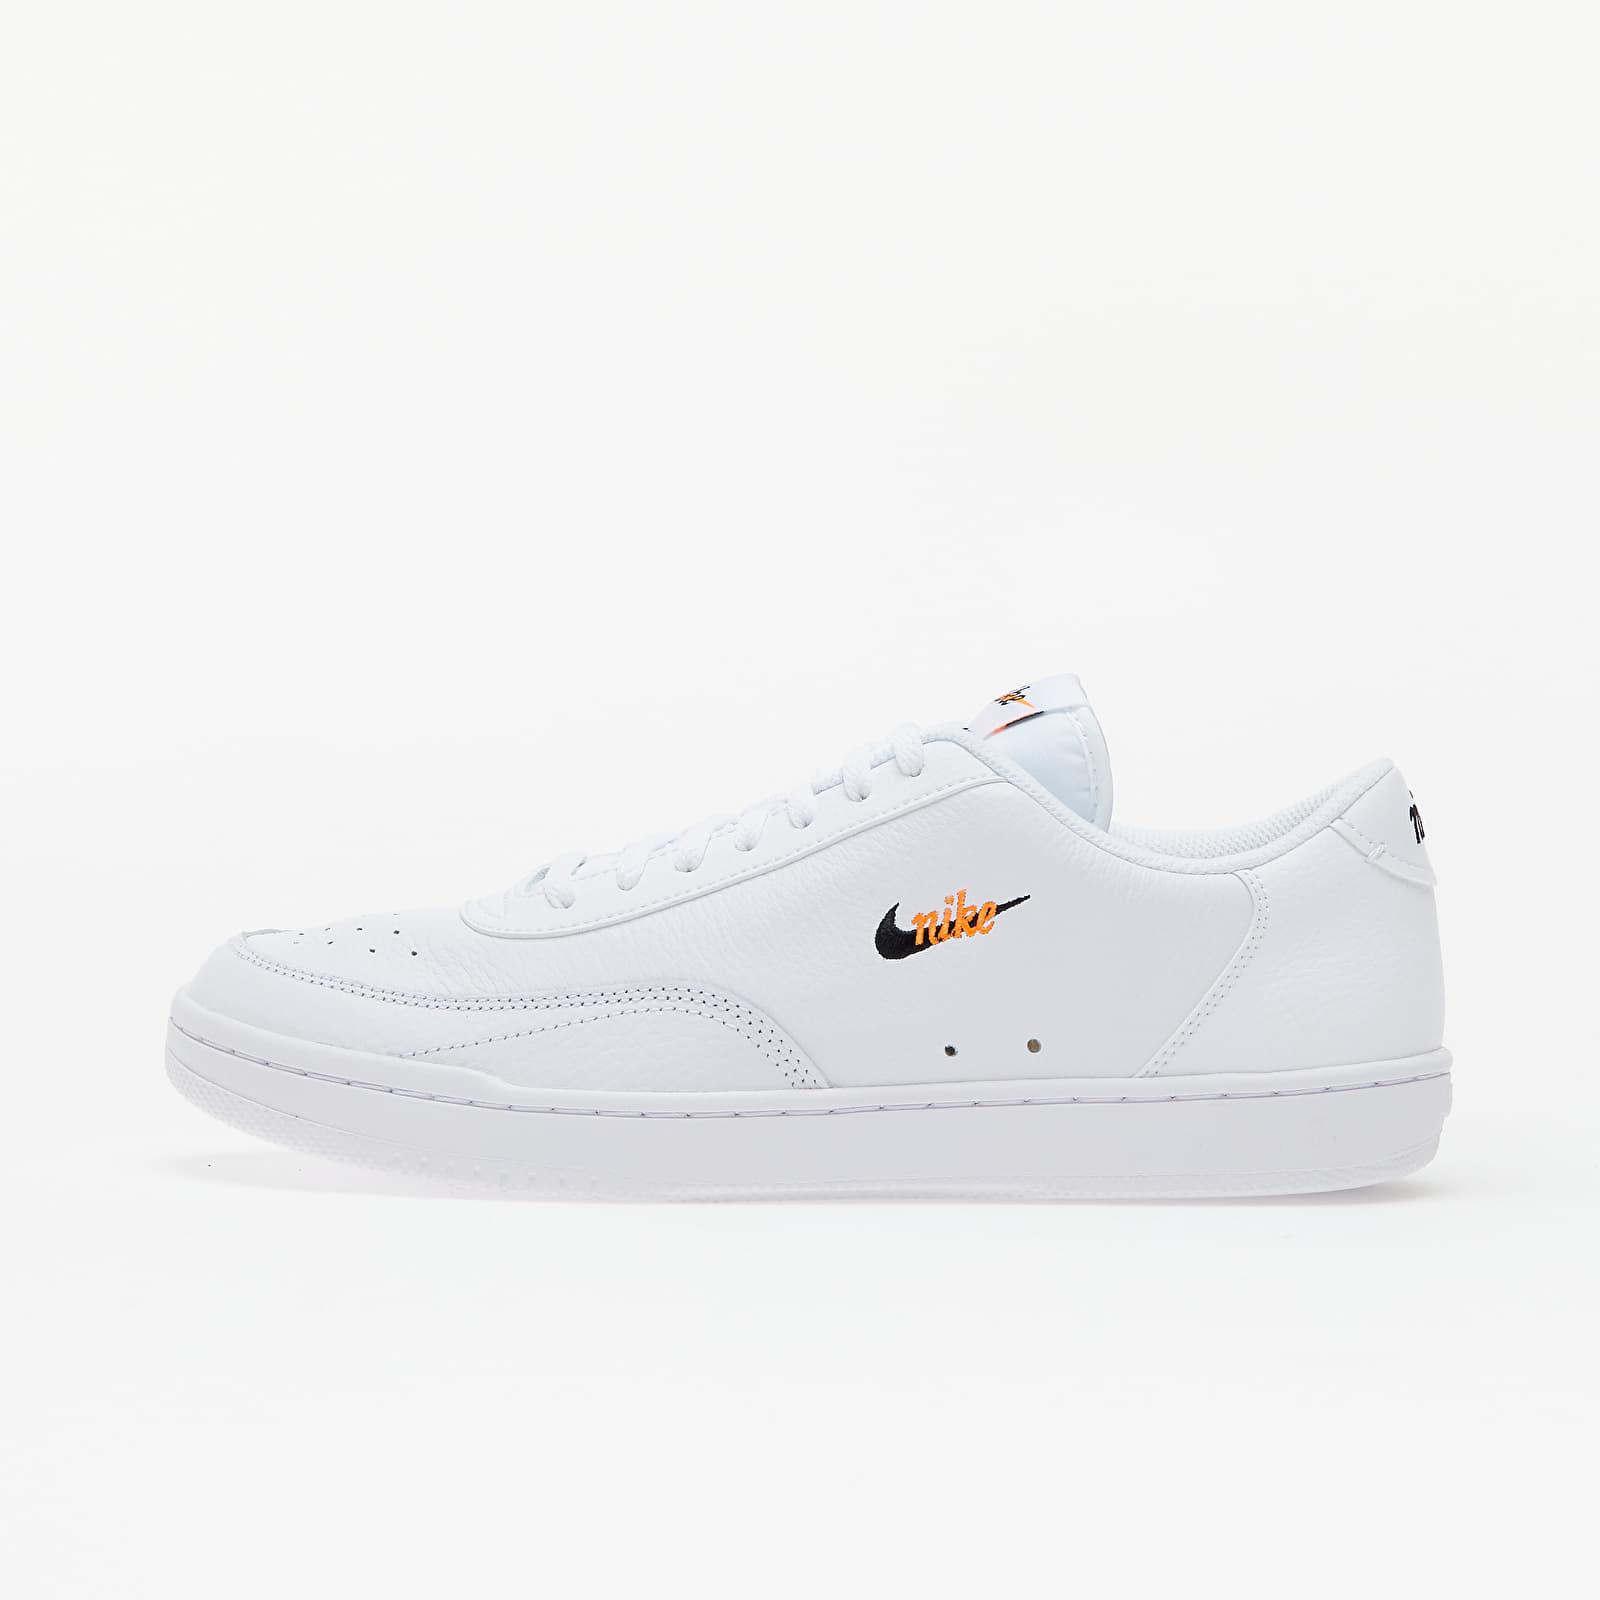 Nike Court Vintage Premium White/ Black-Total Orange CT1726-100